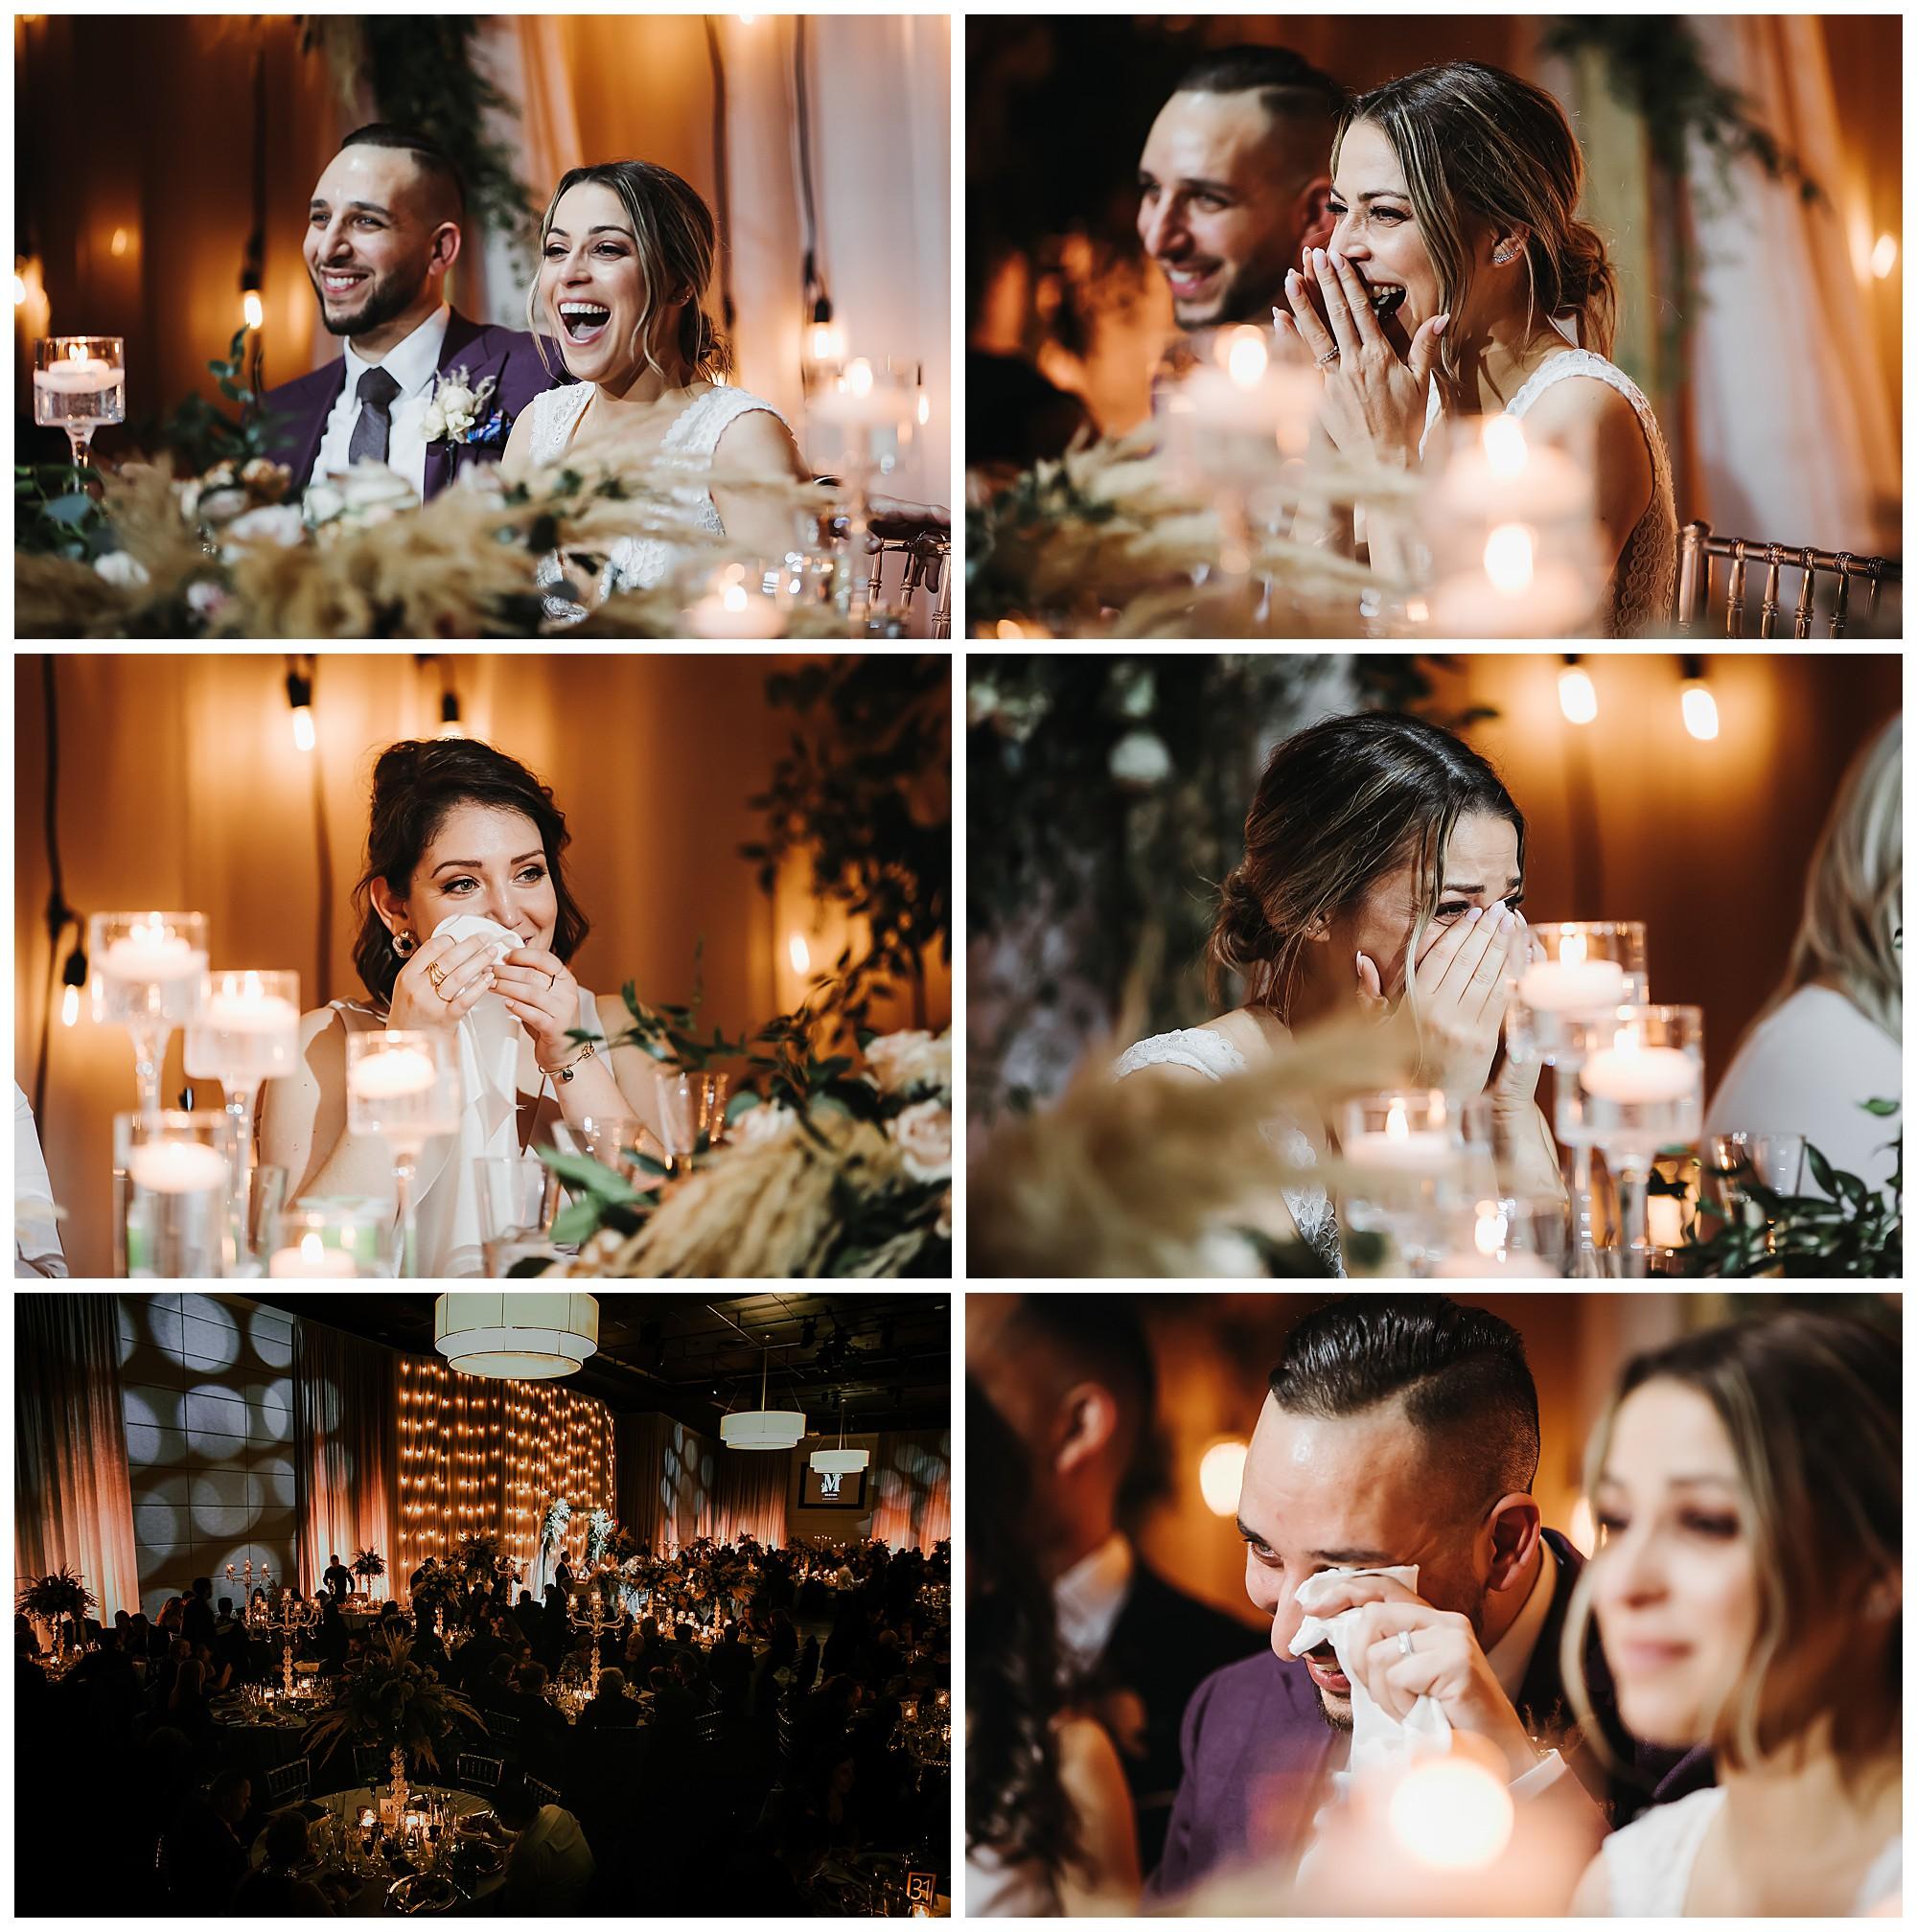 Joanna-Christos-Grand-Luxe-Wedding-Photos-Mint-Room-Toronto-VanDaele-Russell_0103.jpg